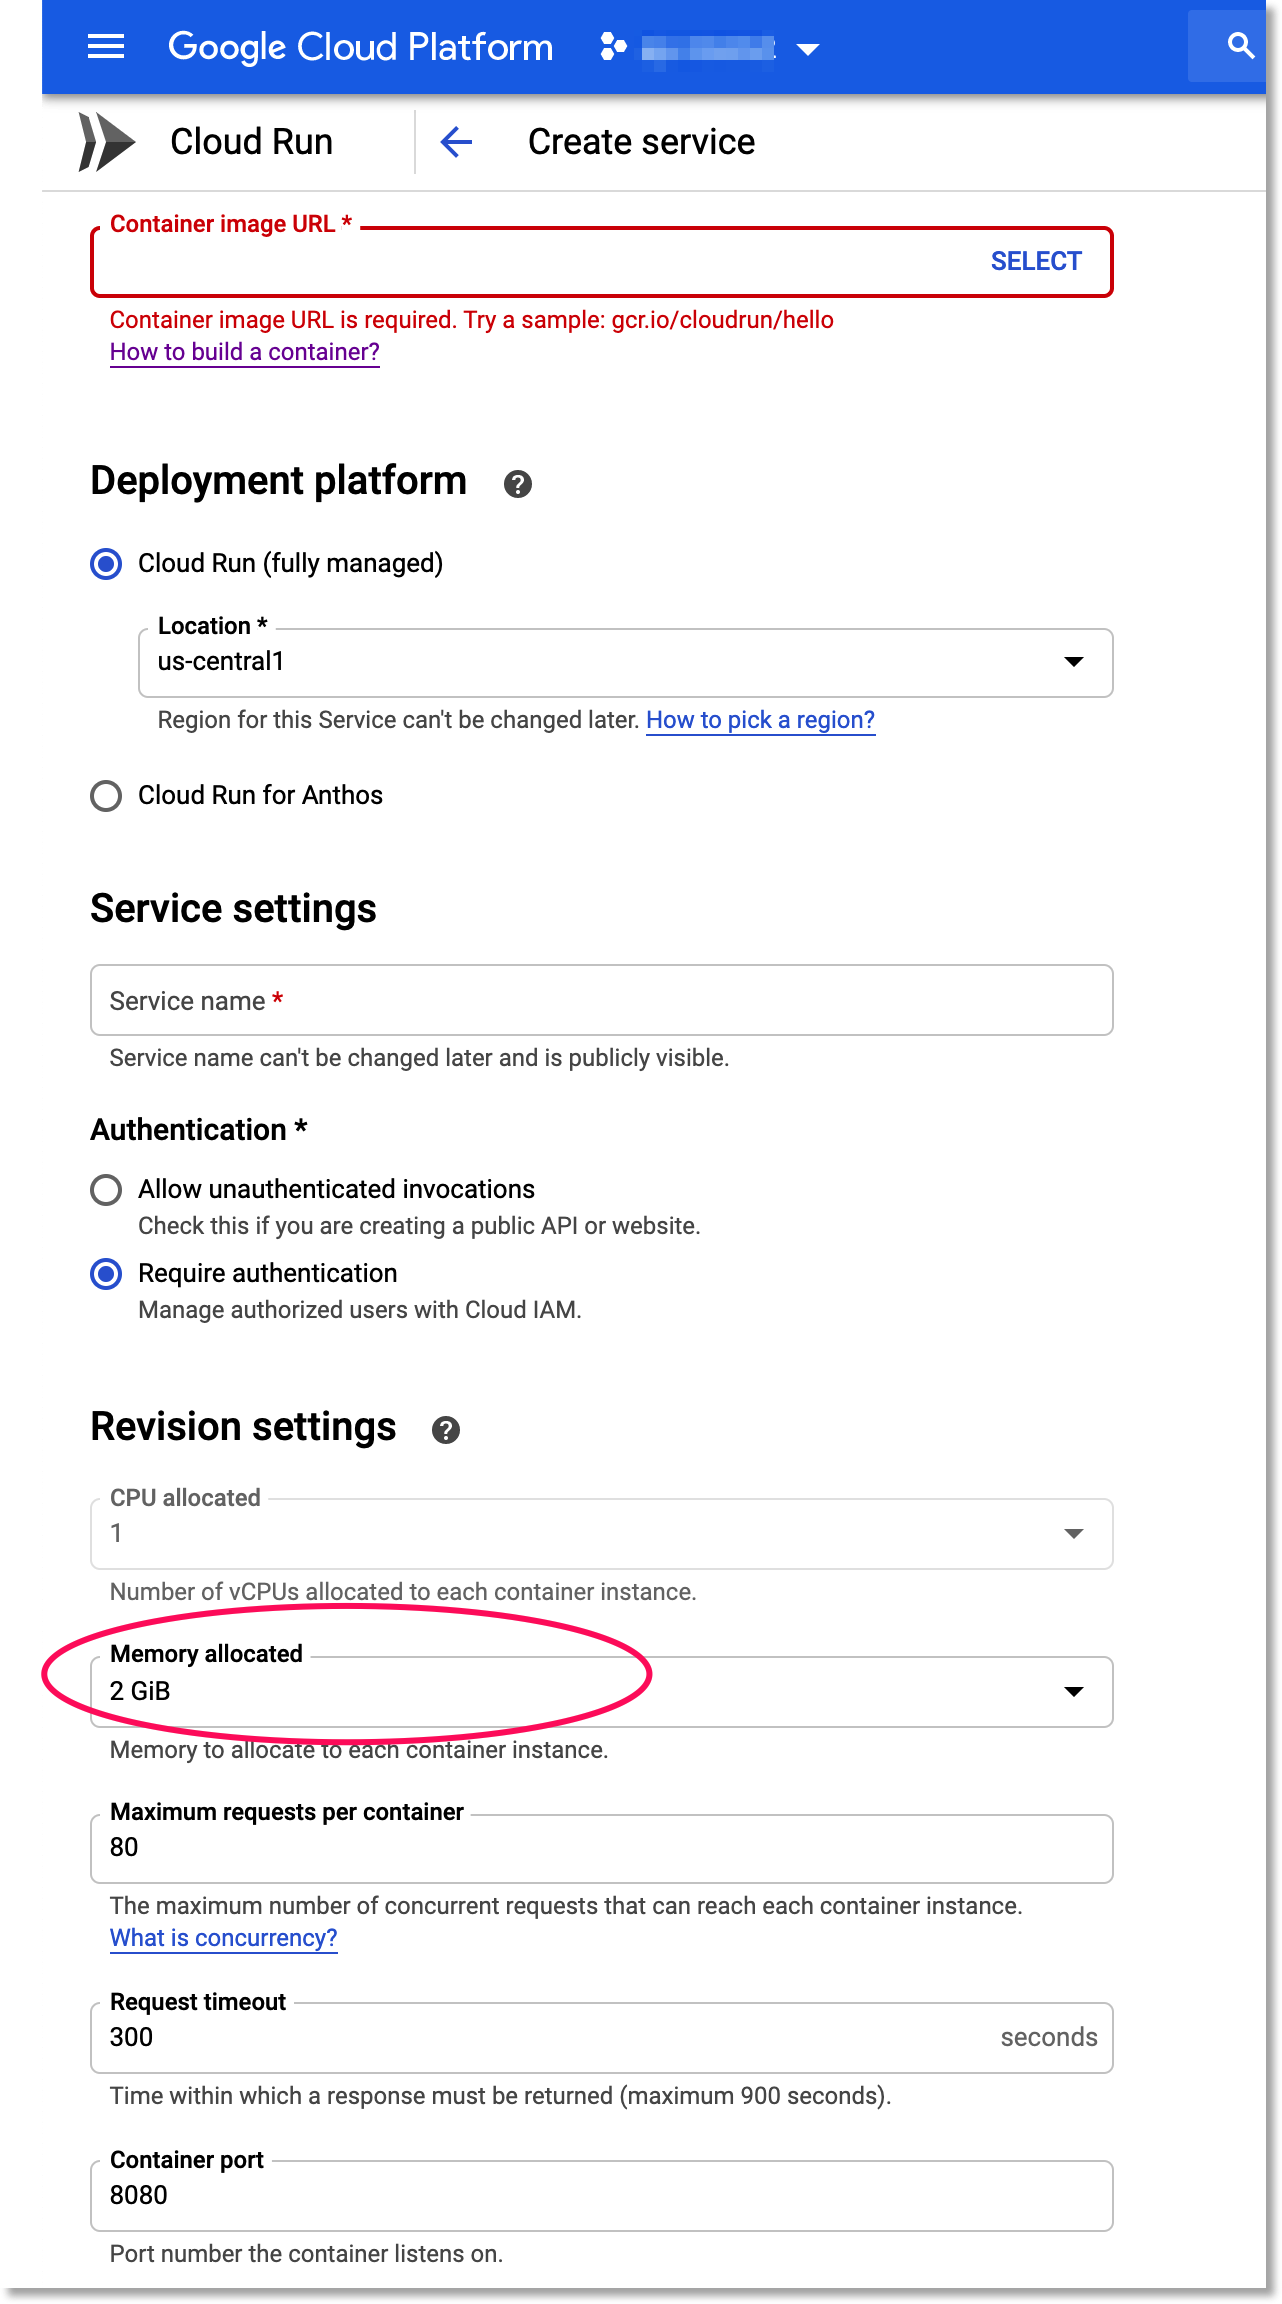 Set service instances to use 2GiB of memory